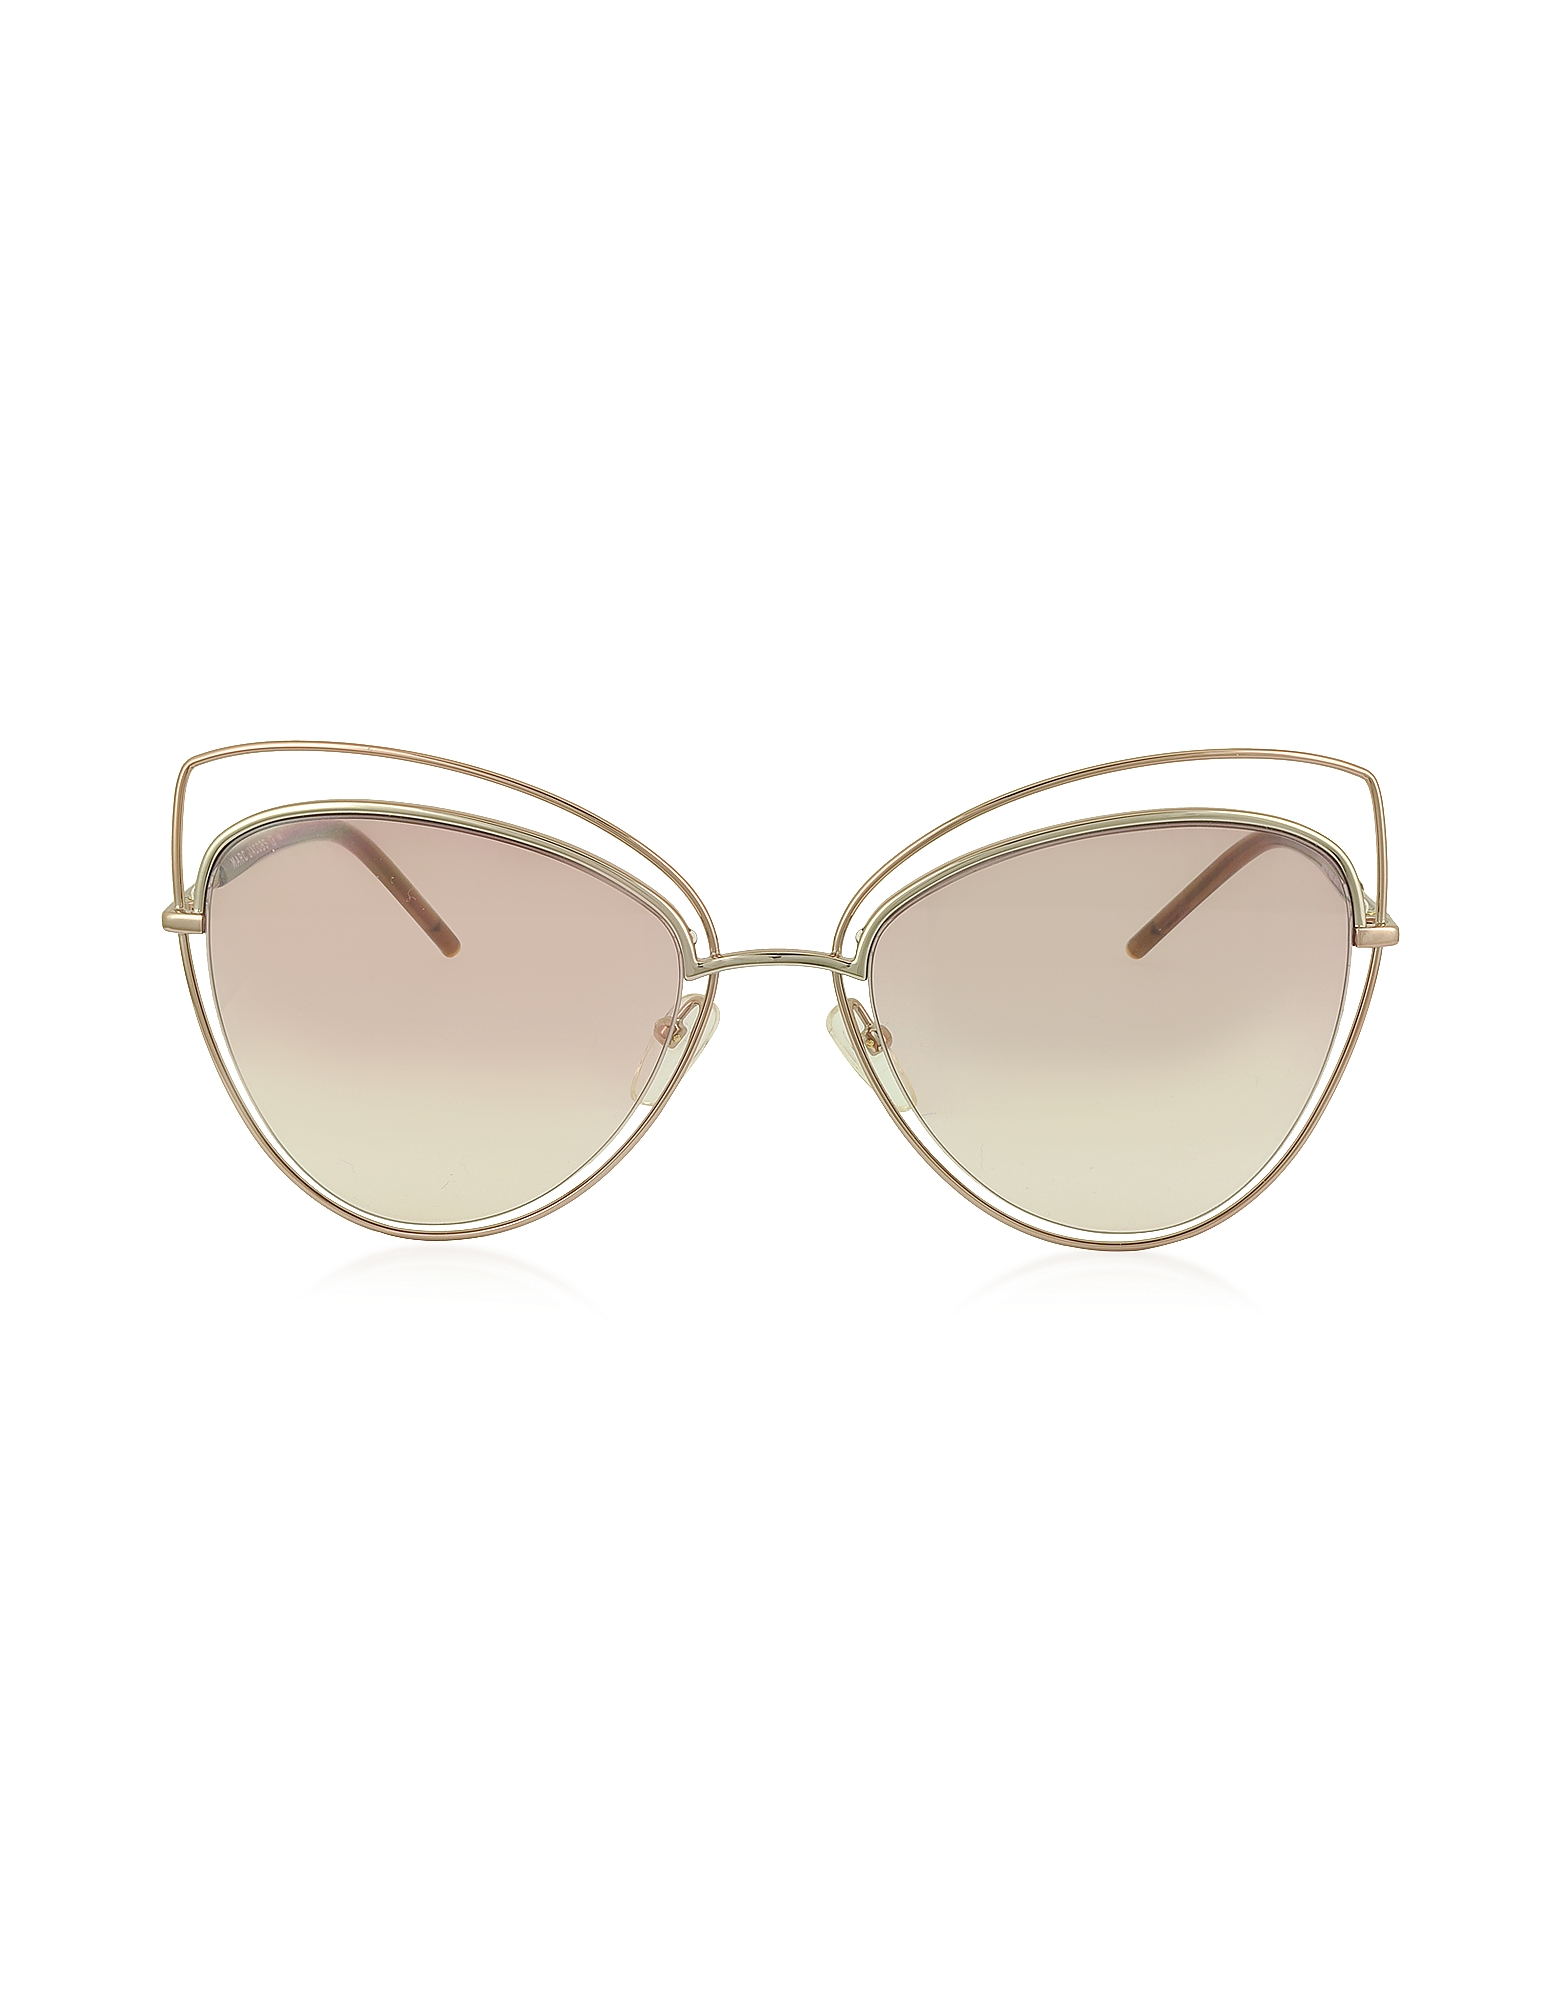 MARC 8/S Metal and Acetate Cat Eye Women's Sunglasses